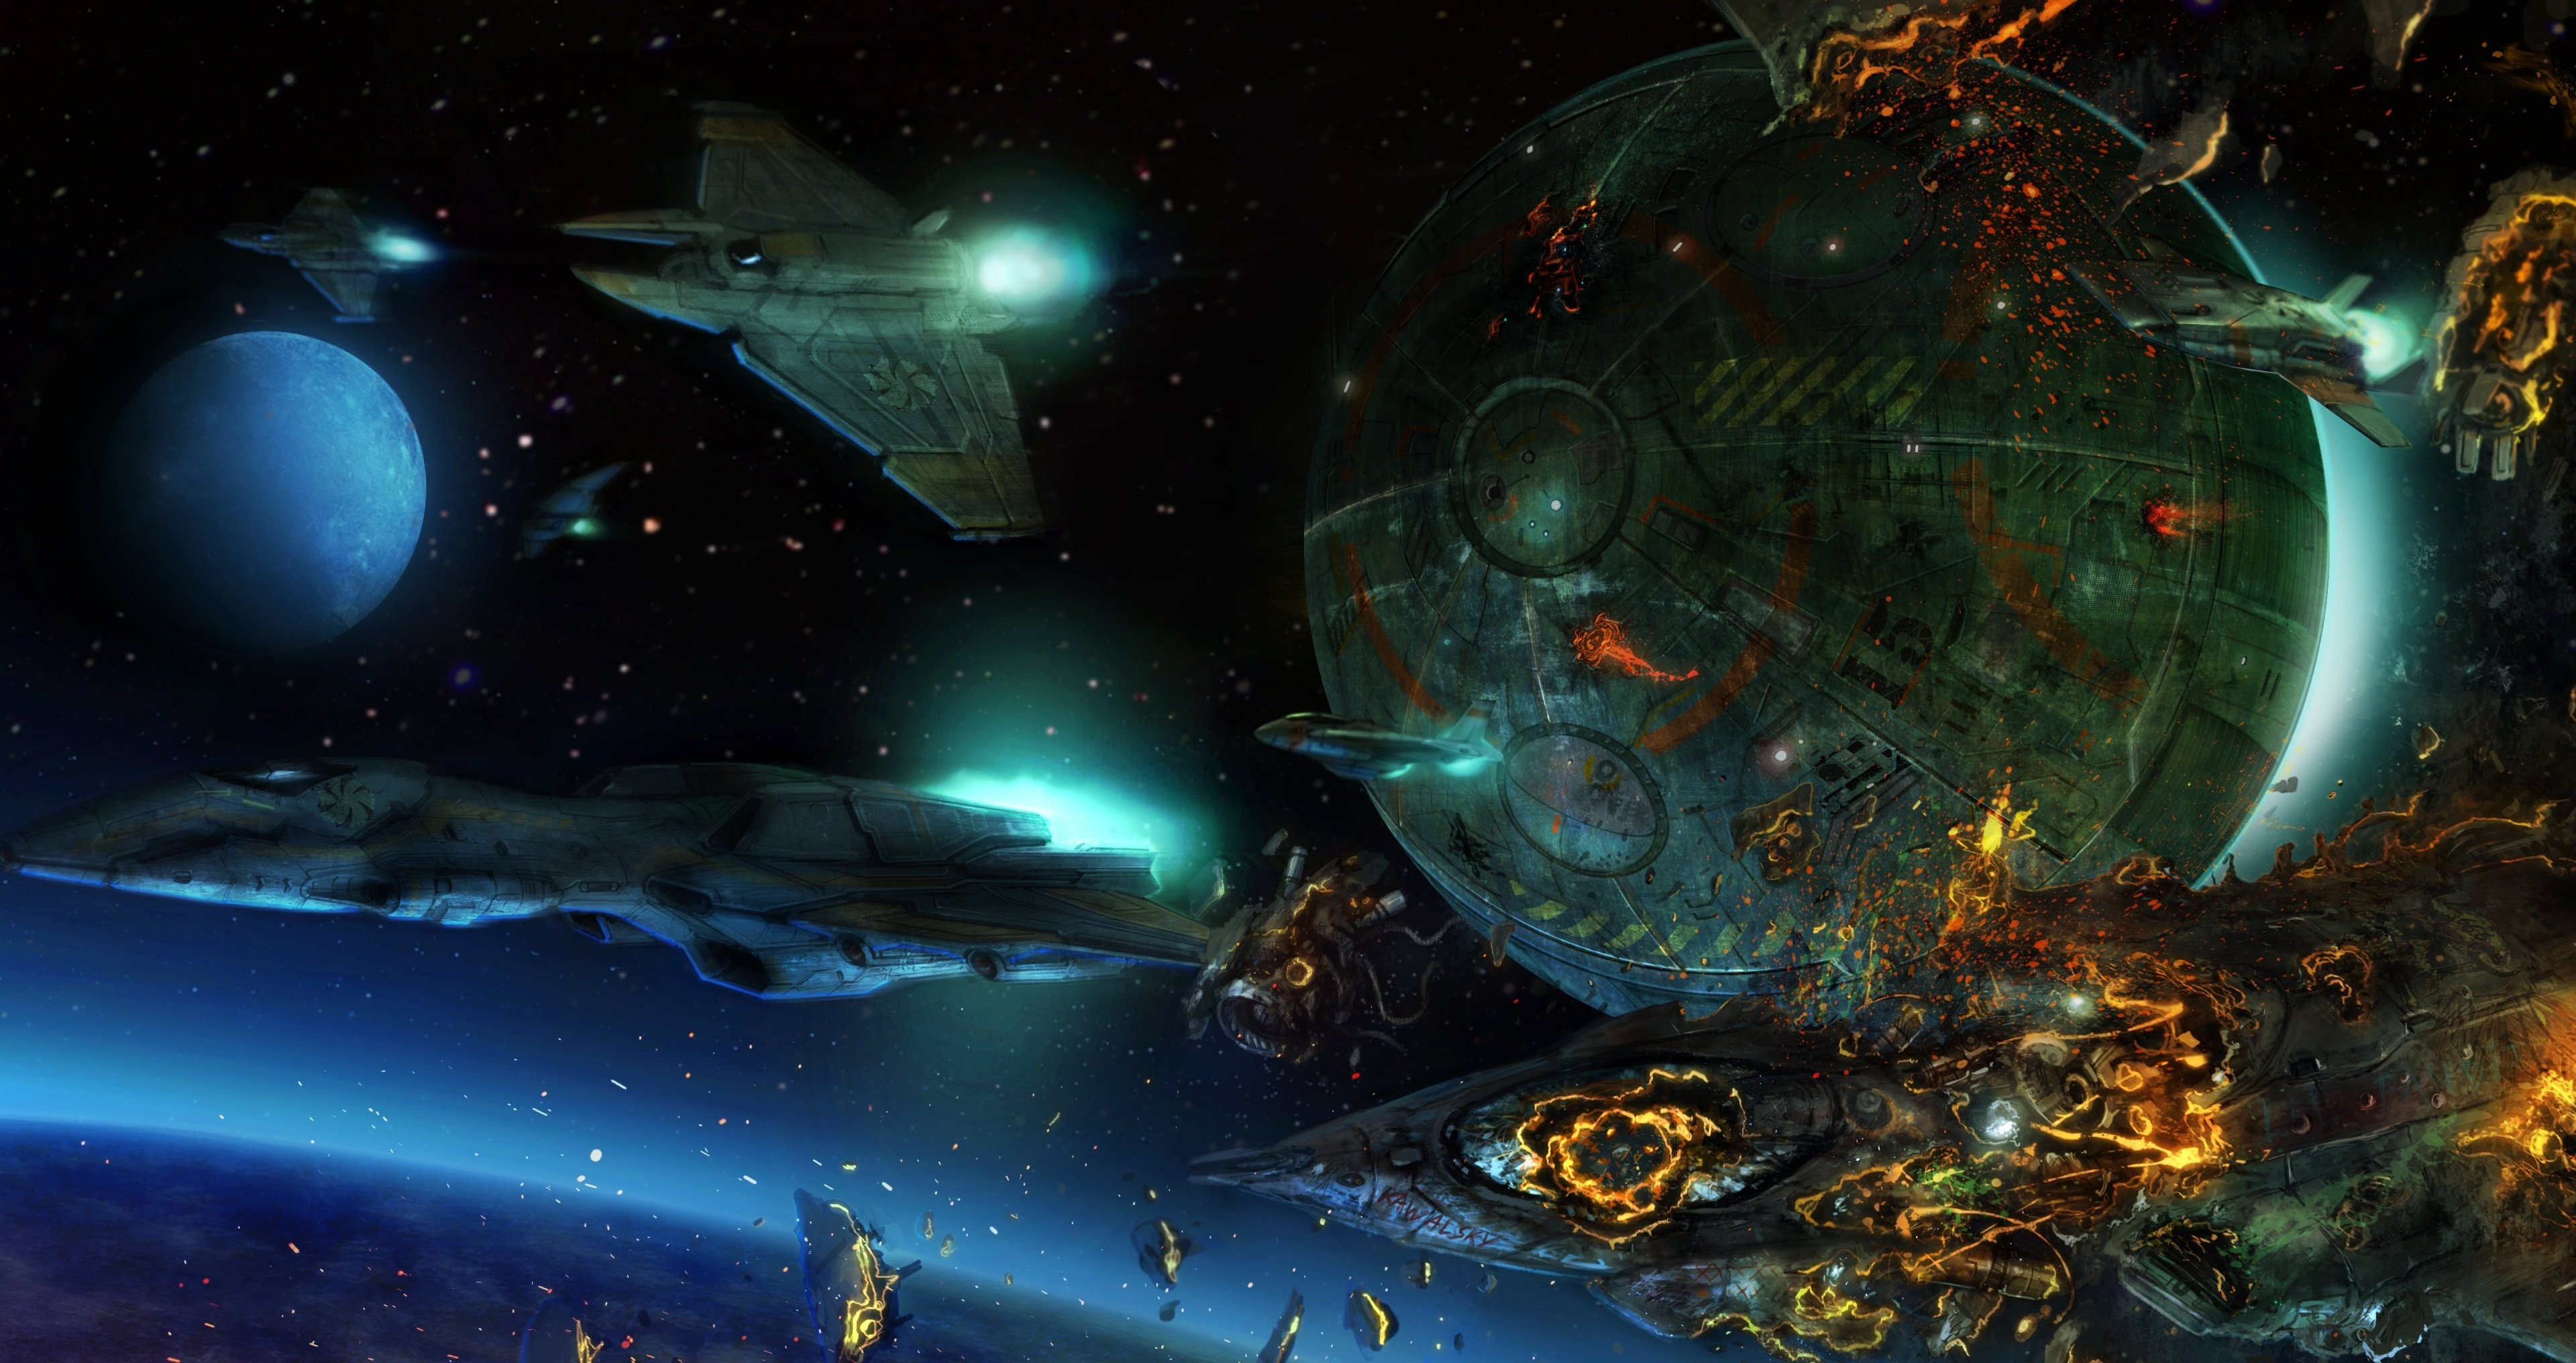 HD Space War Desktop Wallpapers   Wallpapers Z 3840x2032